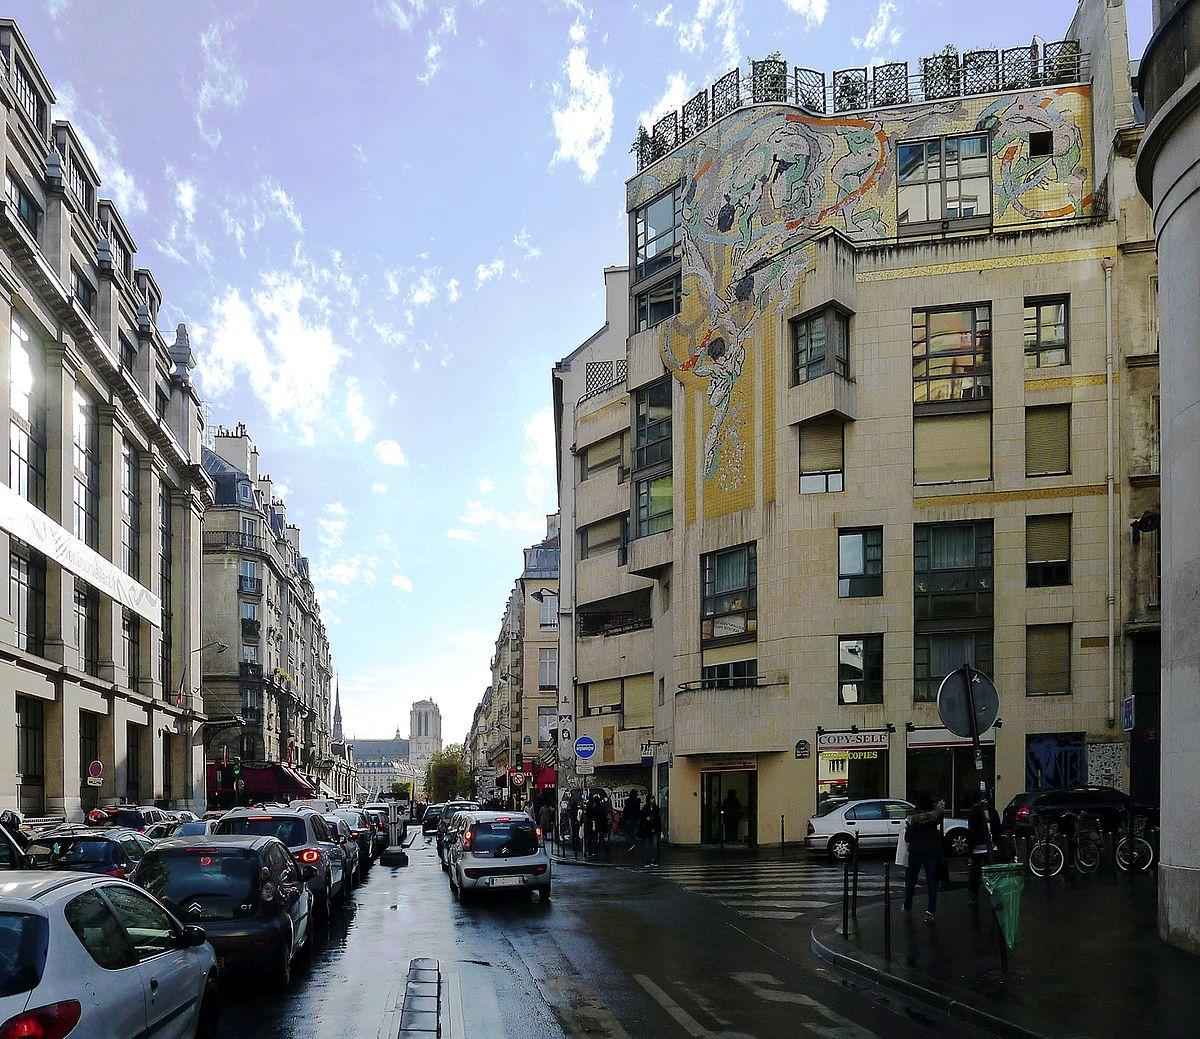 Rue du renard wikip dia - Hotel avec piscine pres de paris ...